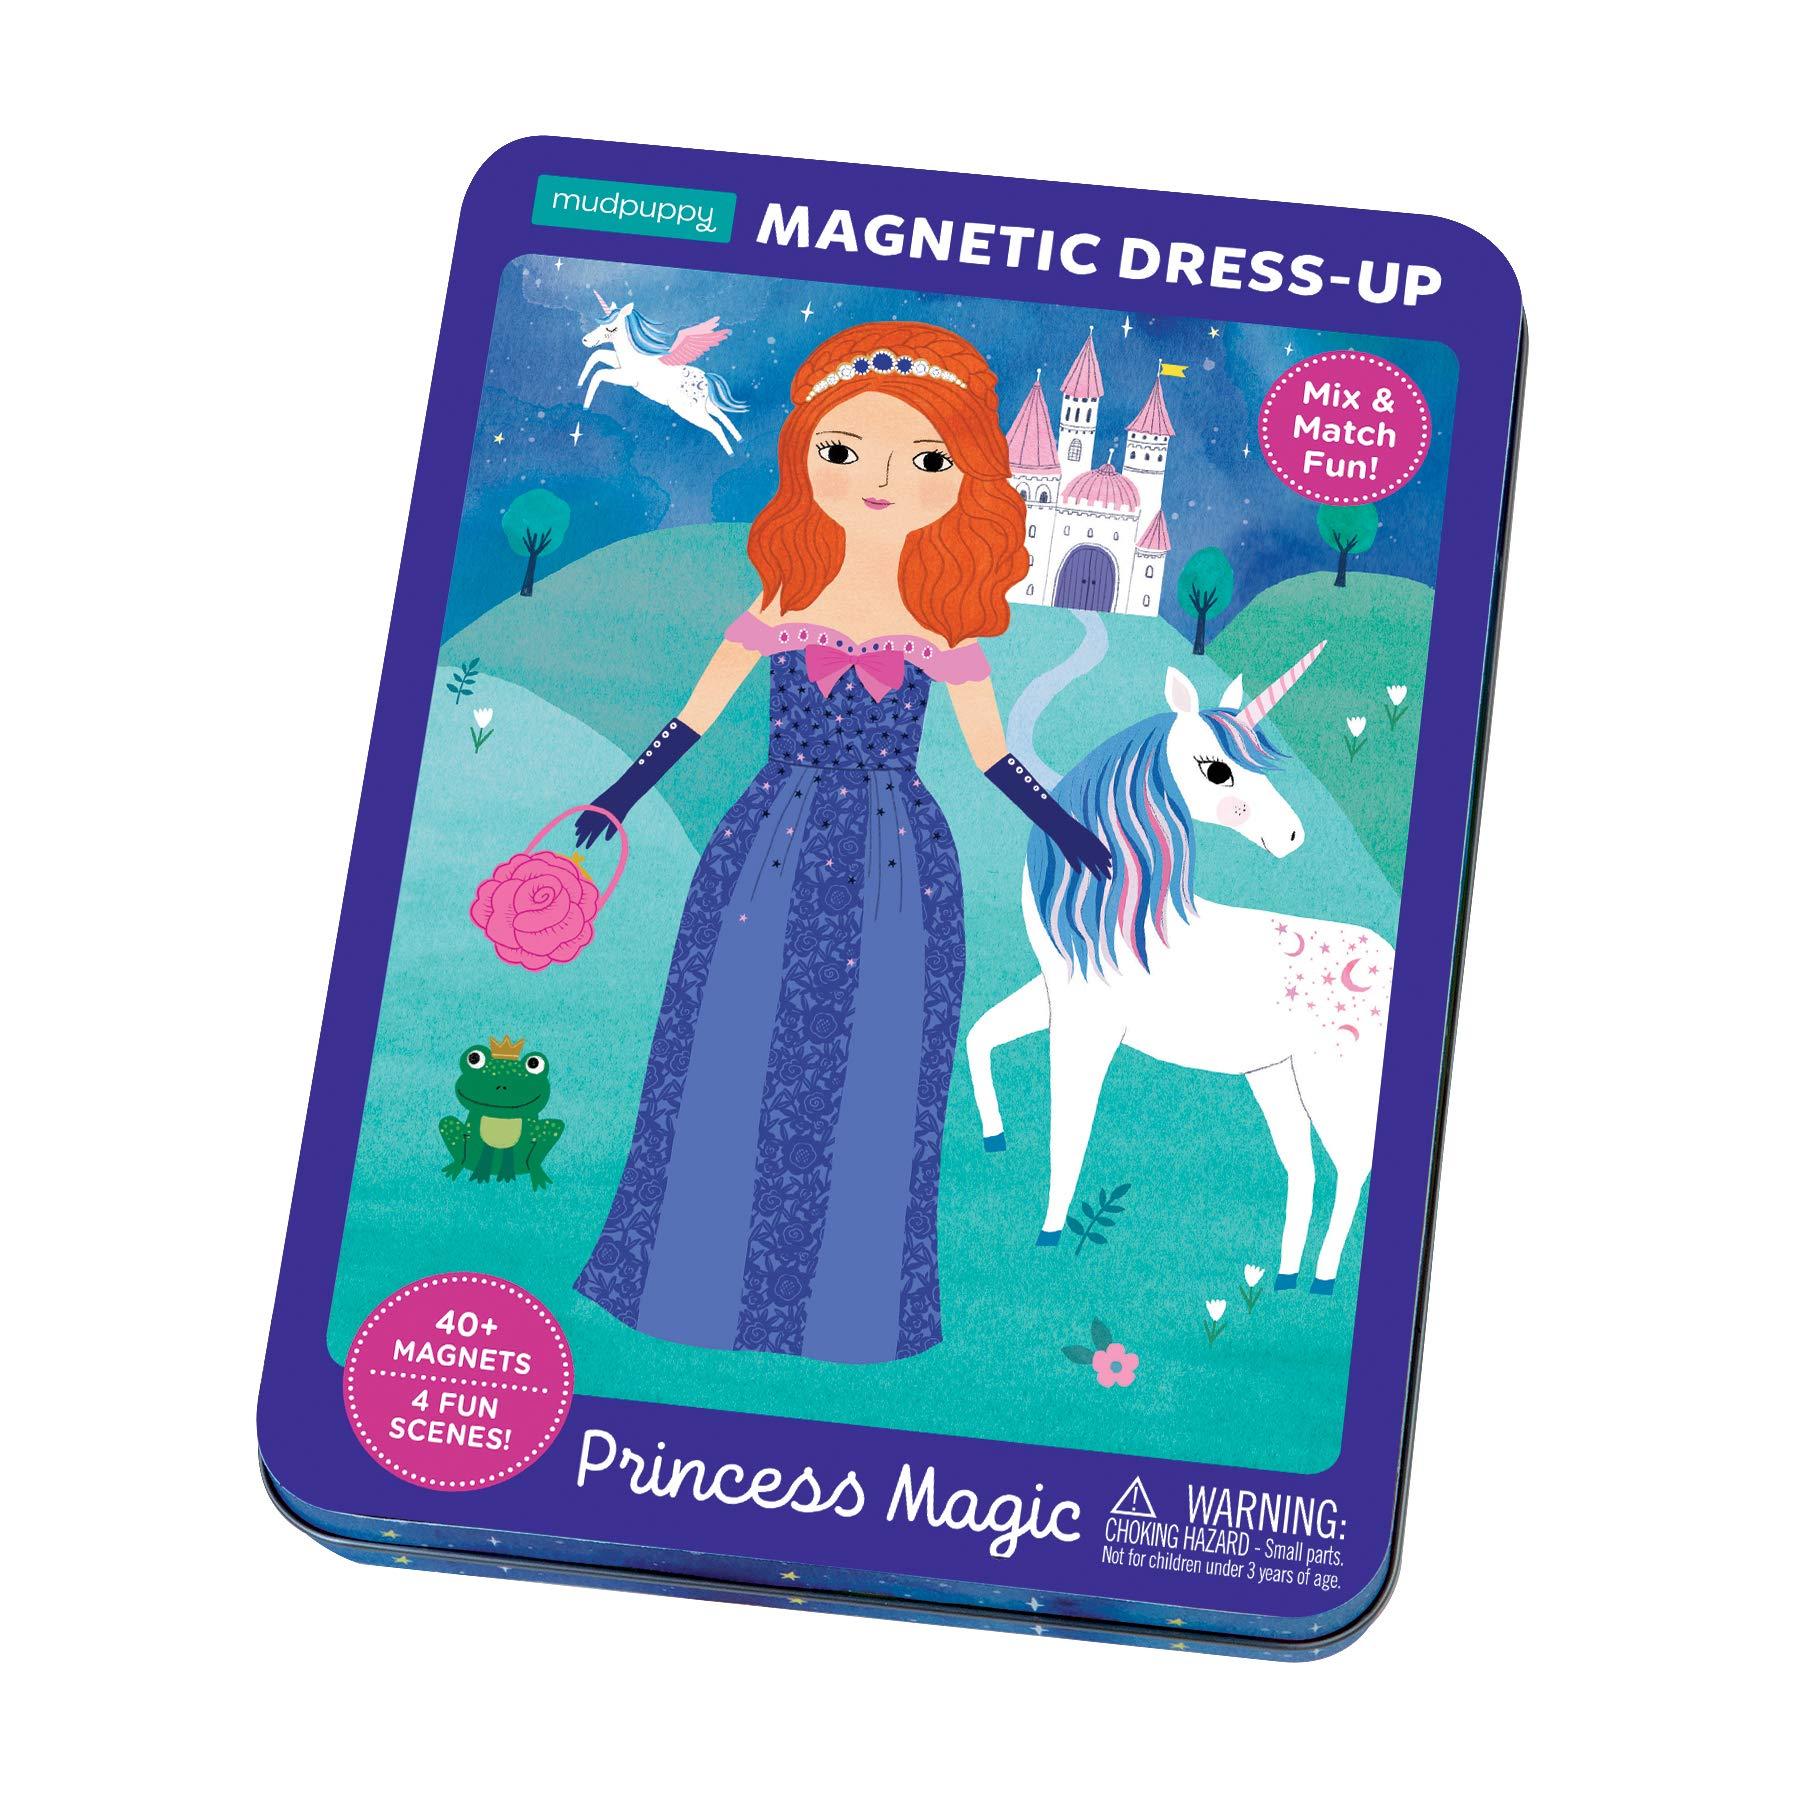 Mudpuppy 9780735357679 Princess Magic Magnetic Dress-Up, Multicolor by Mudpuppy